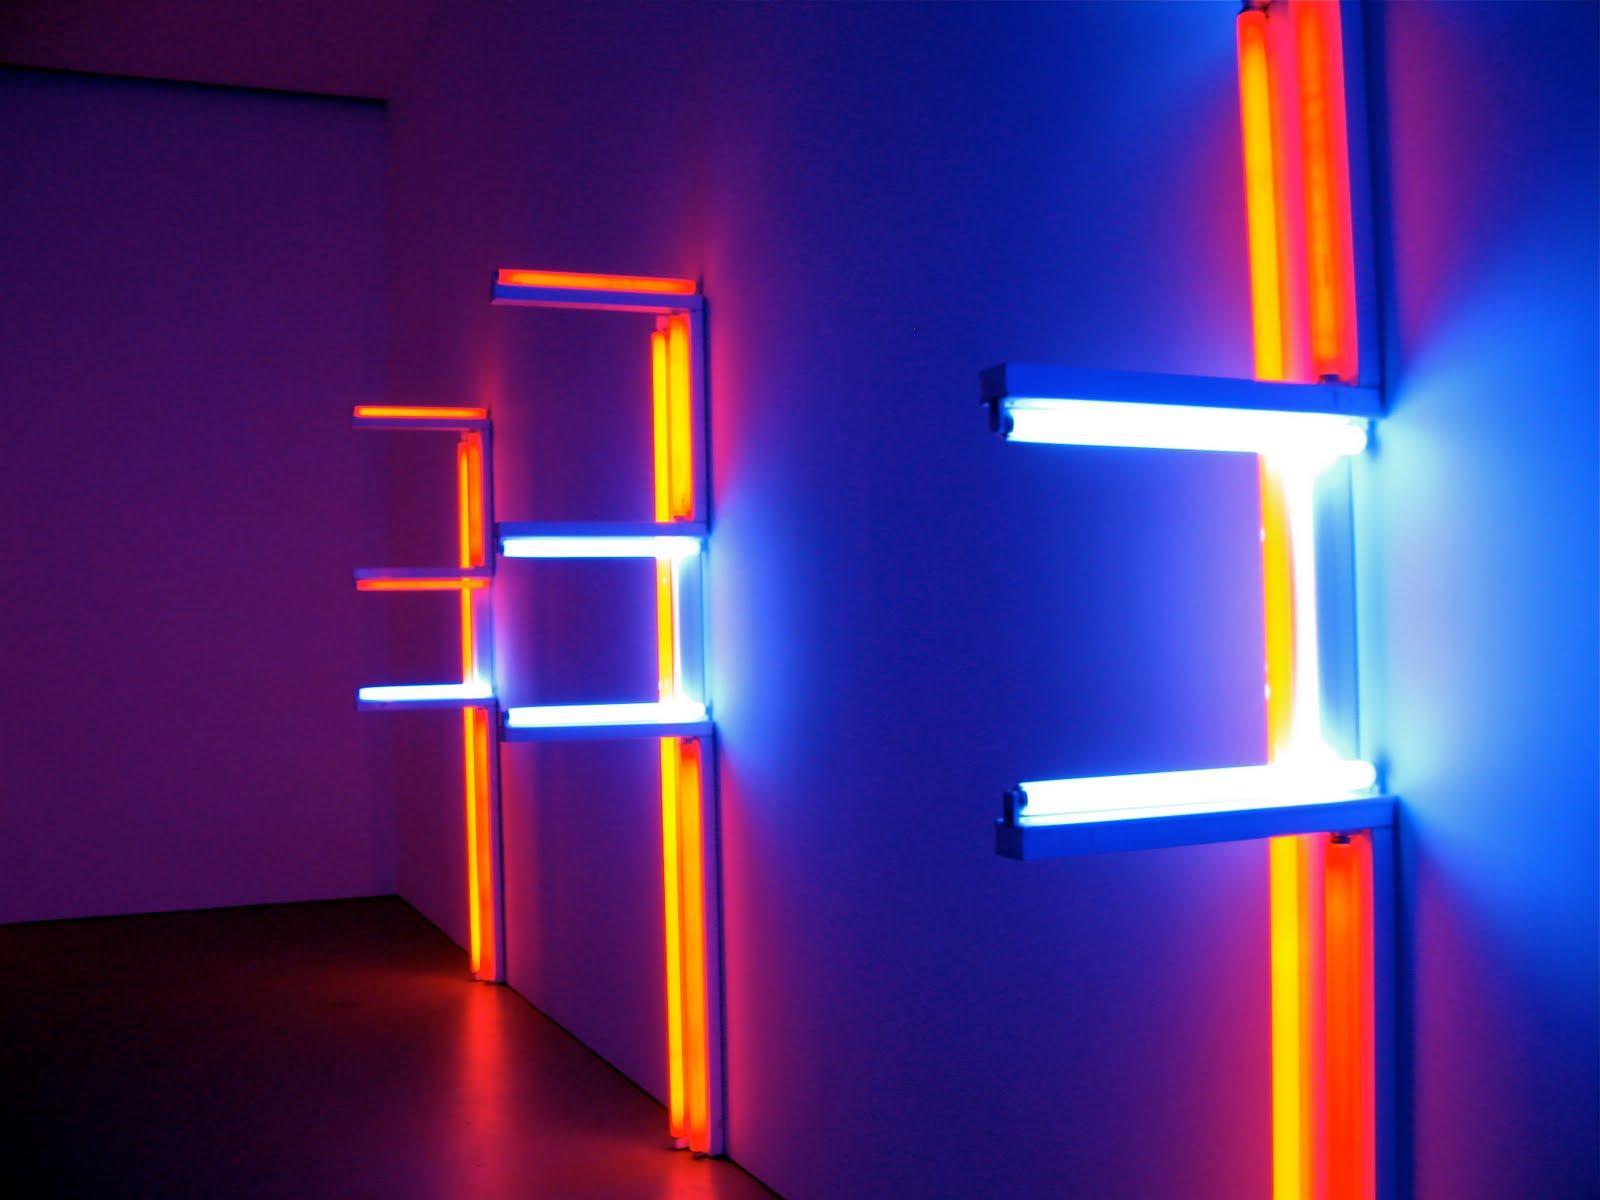 We dare speak a moment only dan flavin for Minimal art neon